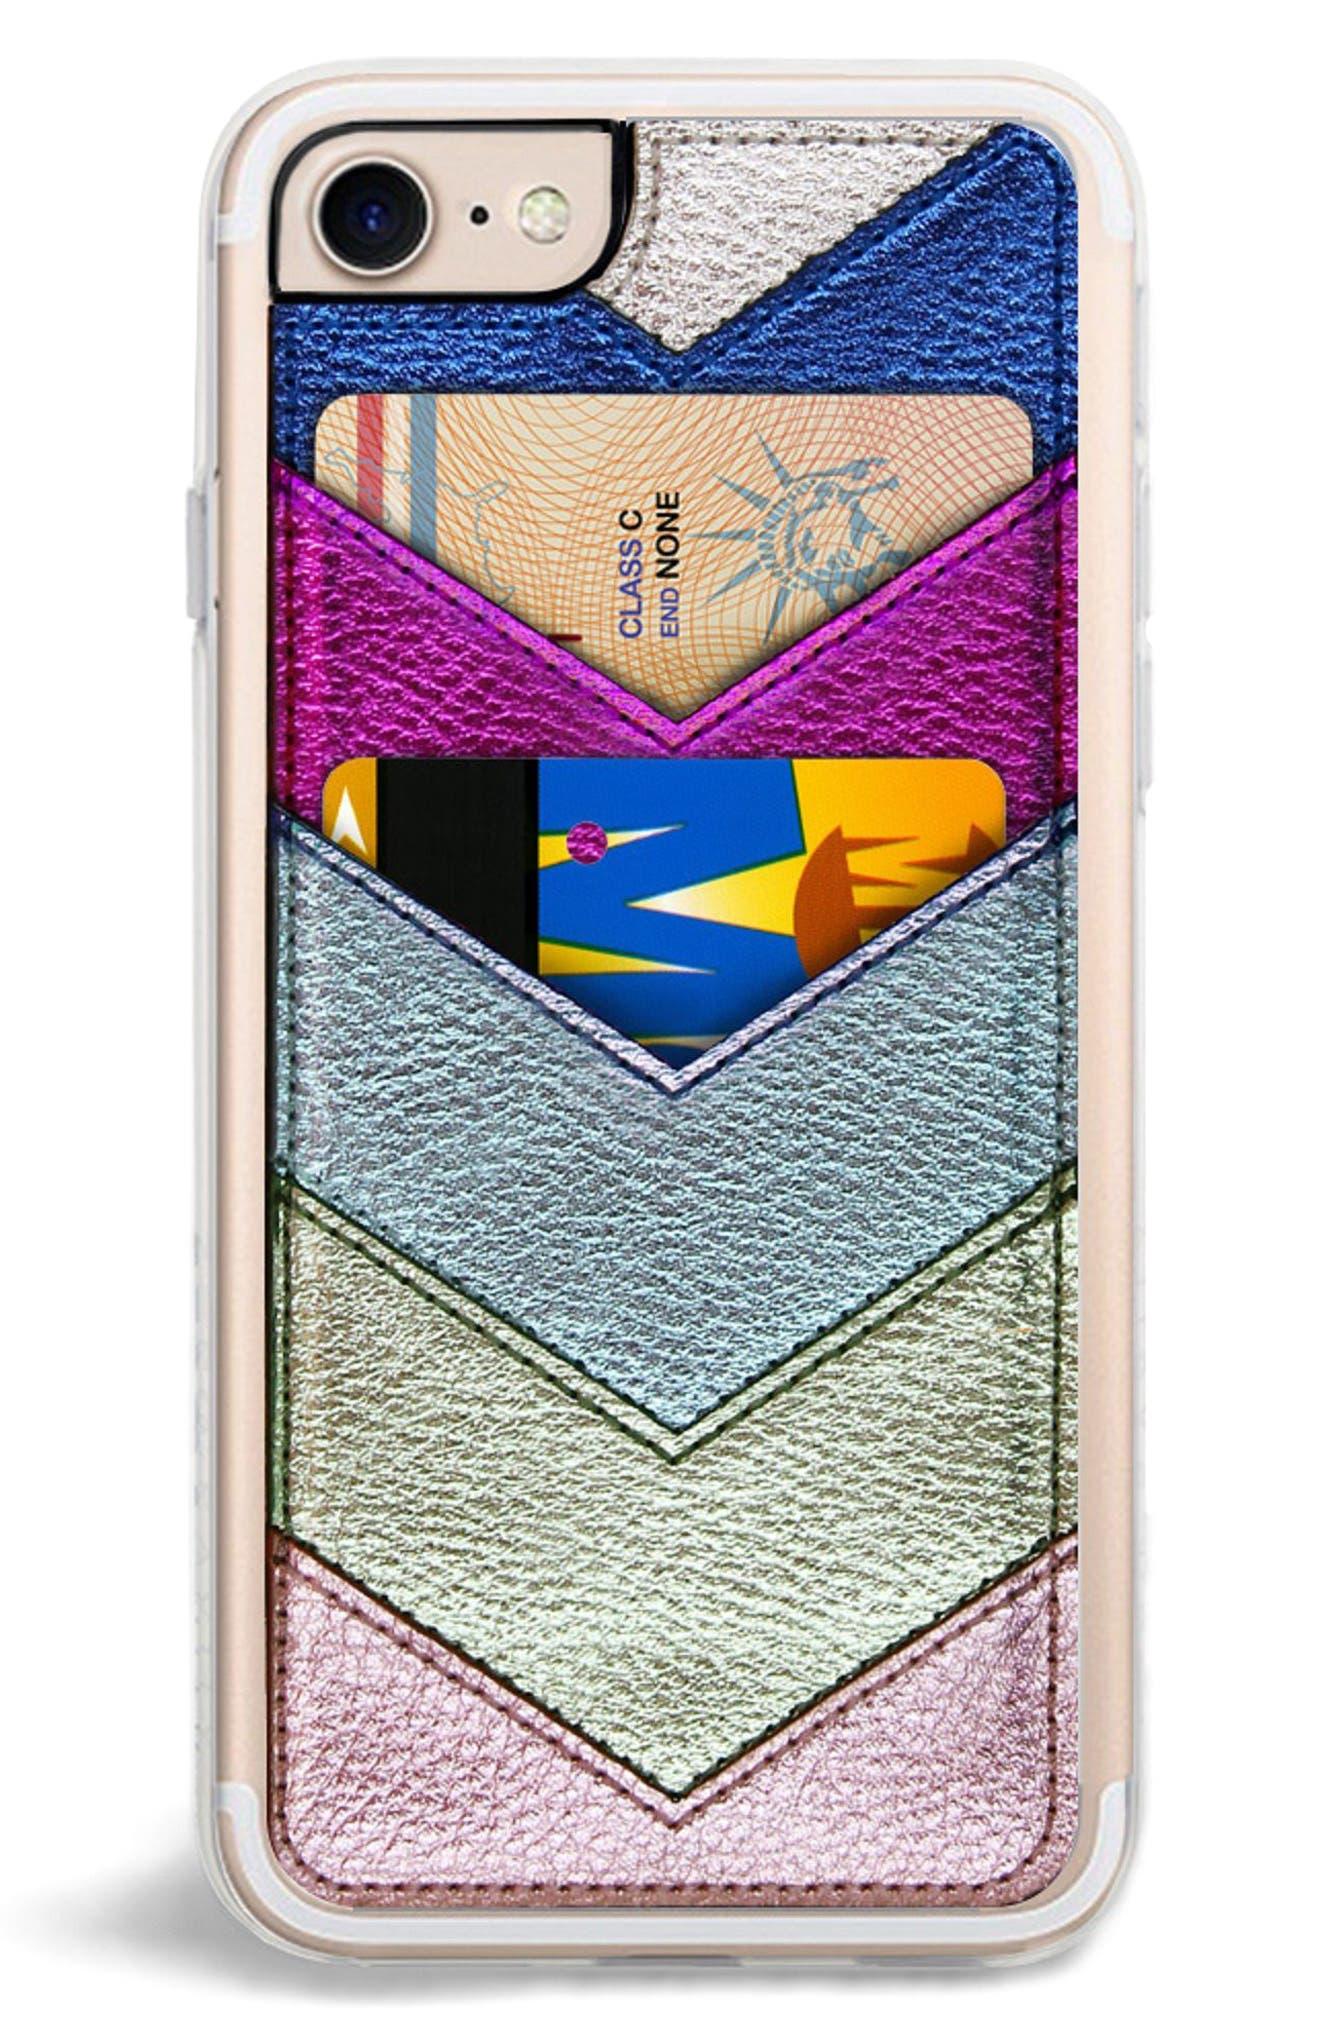 Chevron Faux Leather iPhone 6/6s/7/8 & 6/6s/7/8 Plus Case,                         Main,                         color, Metallic Multi